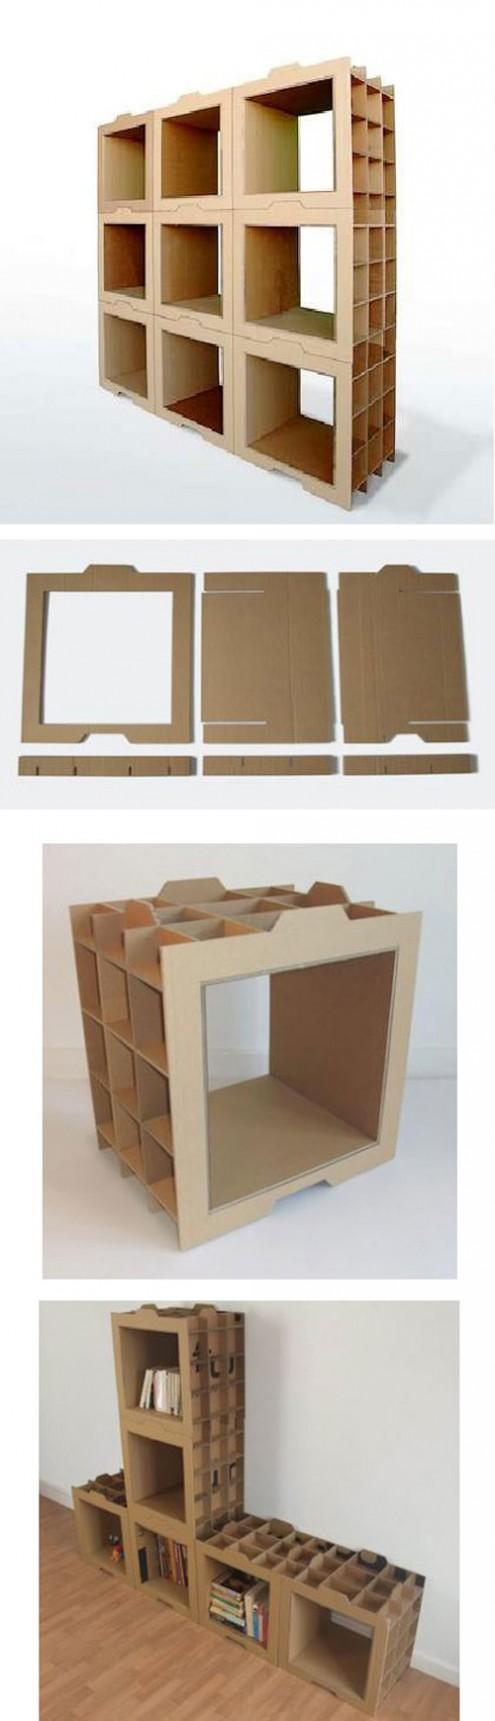 Estanterías con piezas de cartón | Cardboard furniture, Craft and ...